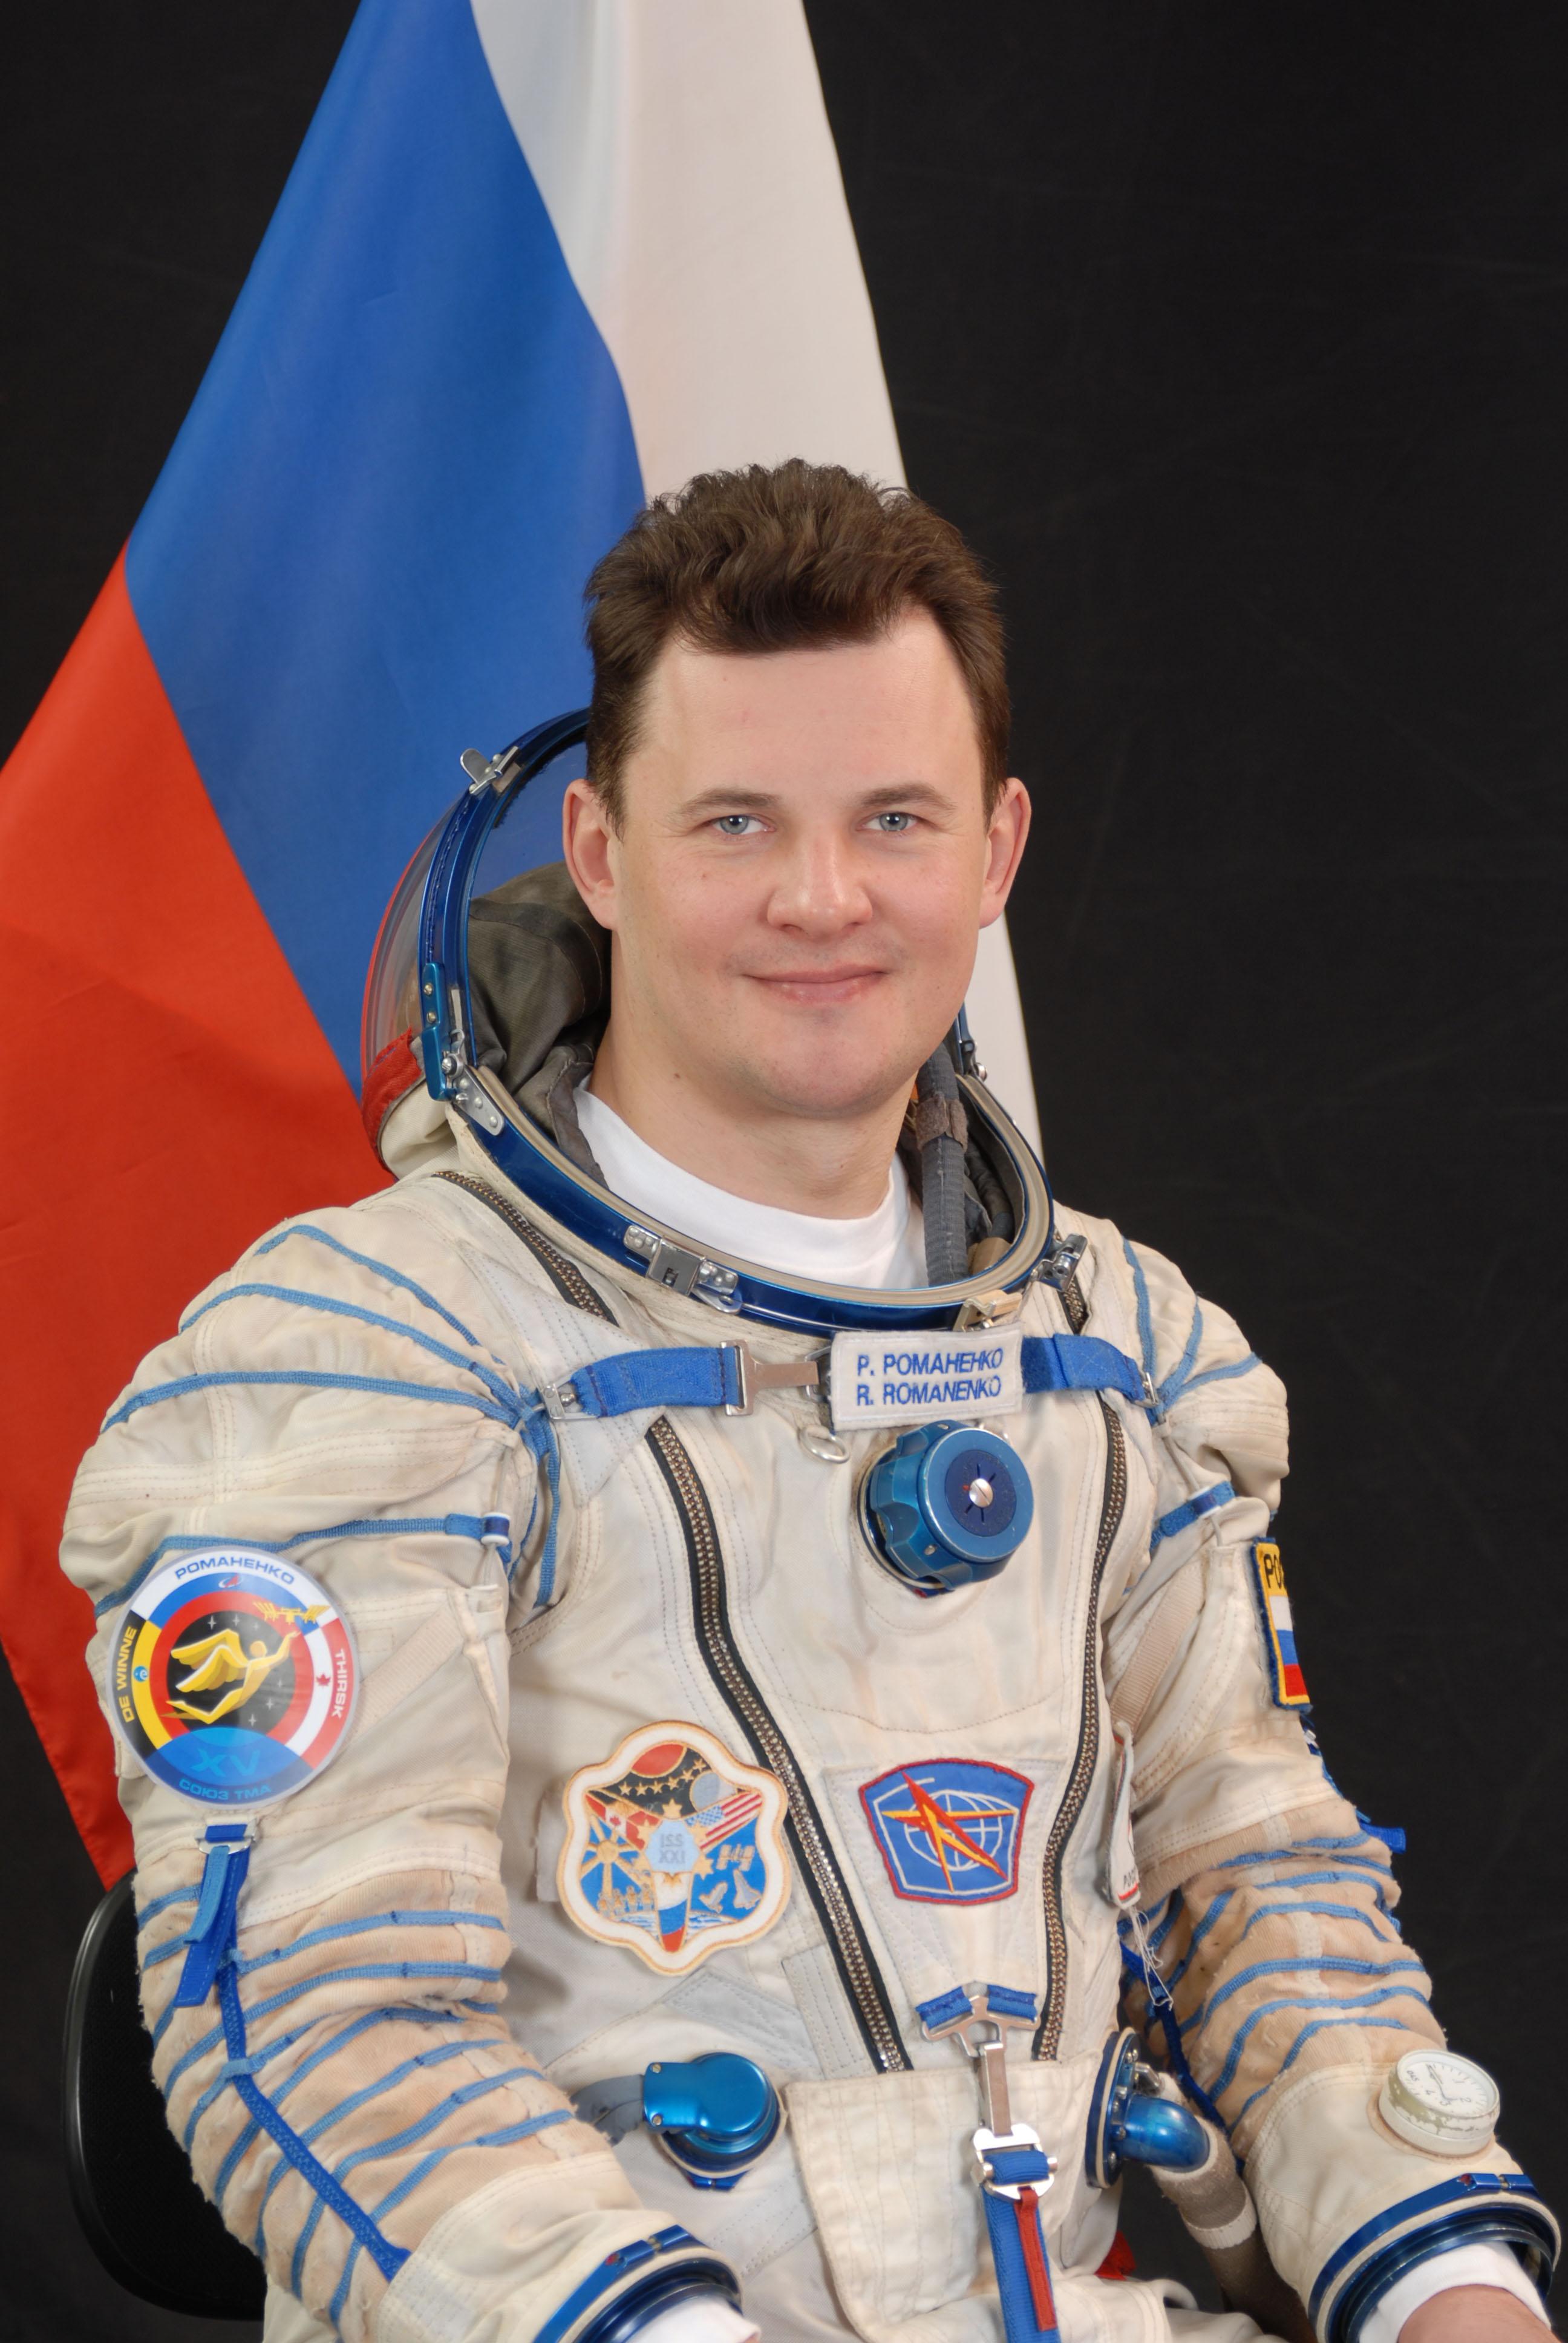 Space in Images - 2009 - 04 - Cosmonaut Roman Romanenko